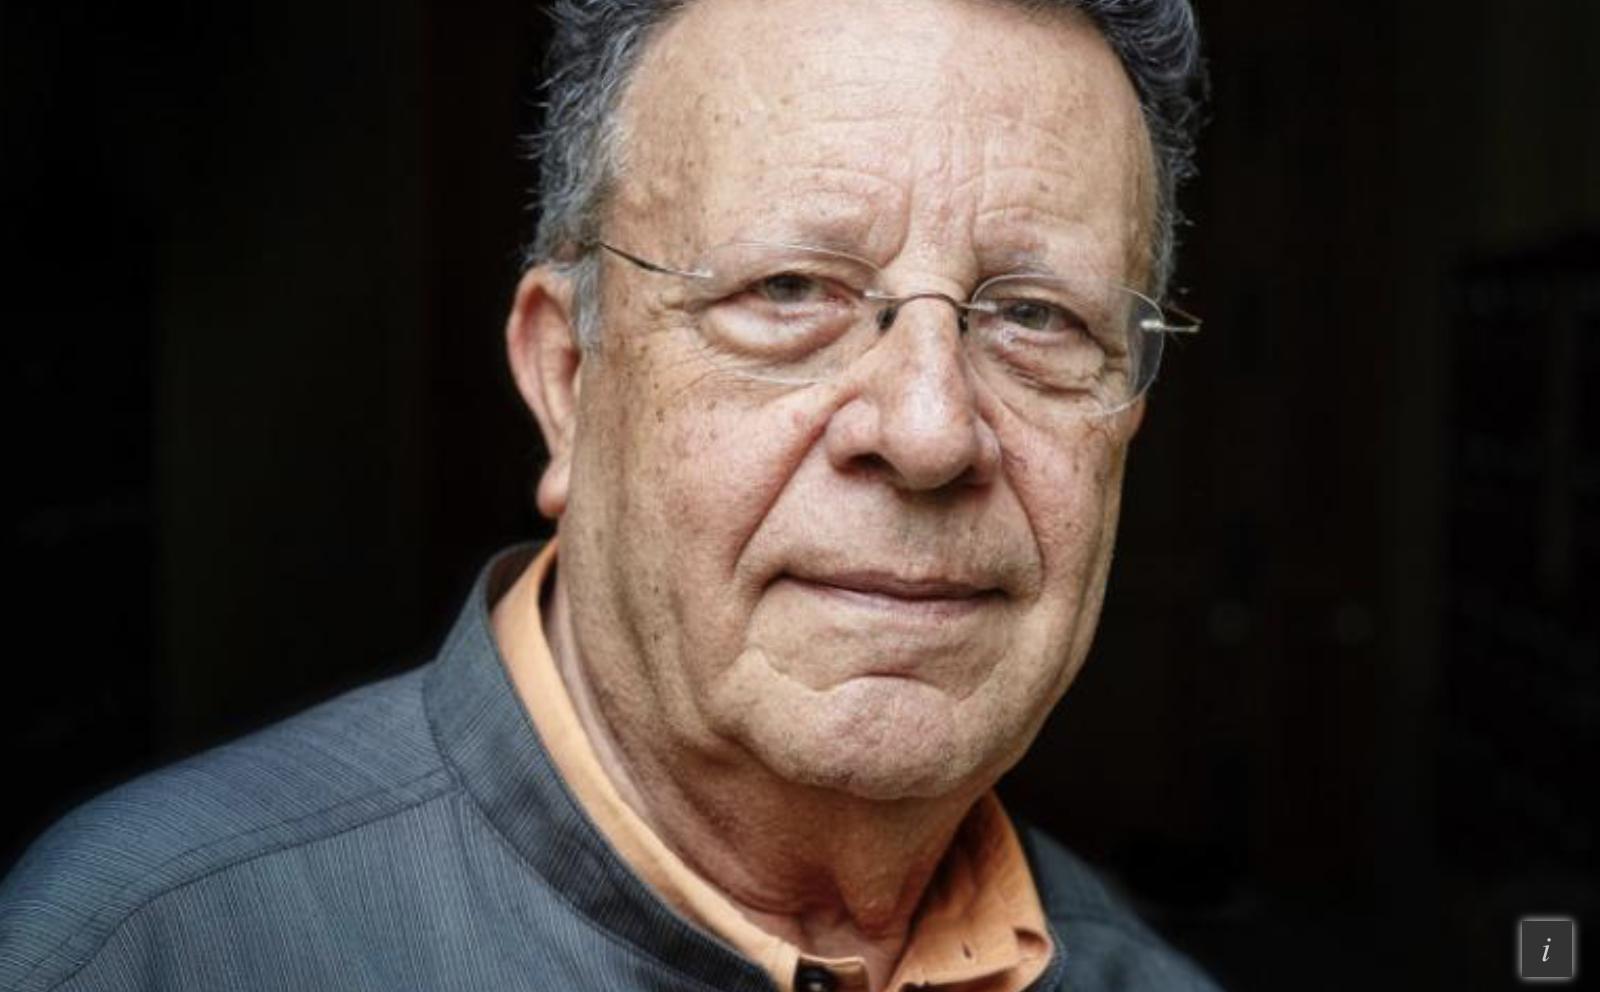 L'empreinte du judaïsme sur la psychanalyse,  avec Gérard Haddad